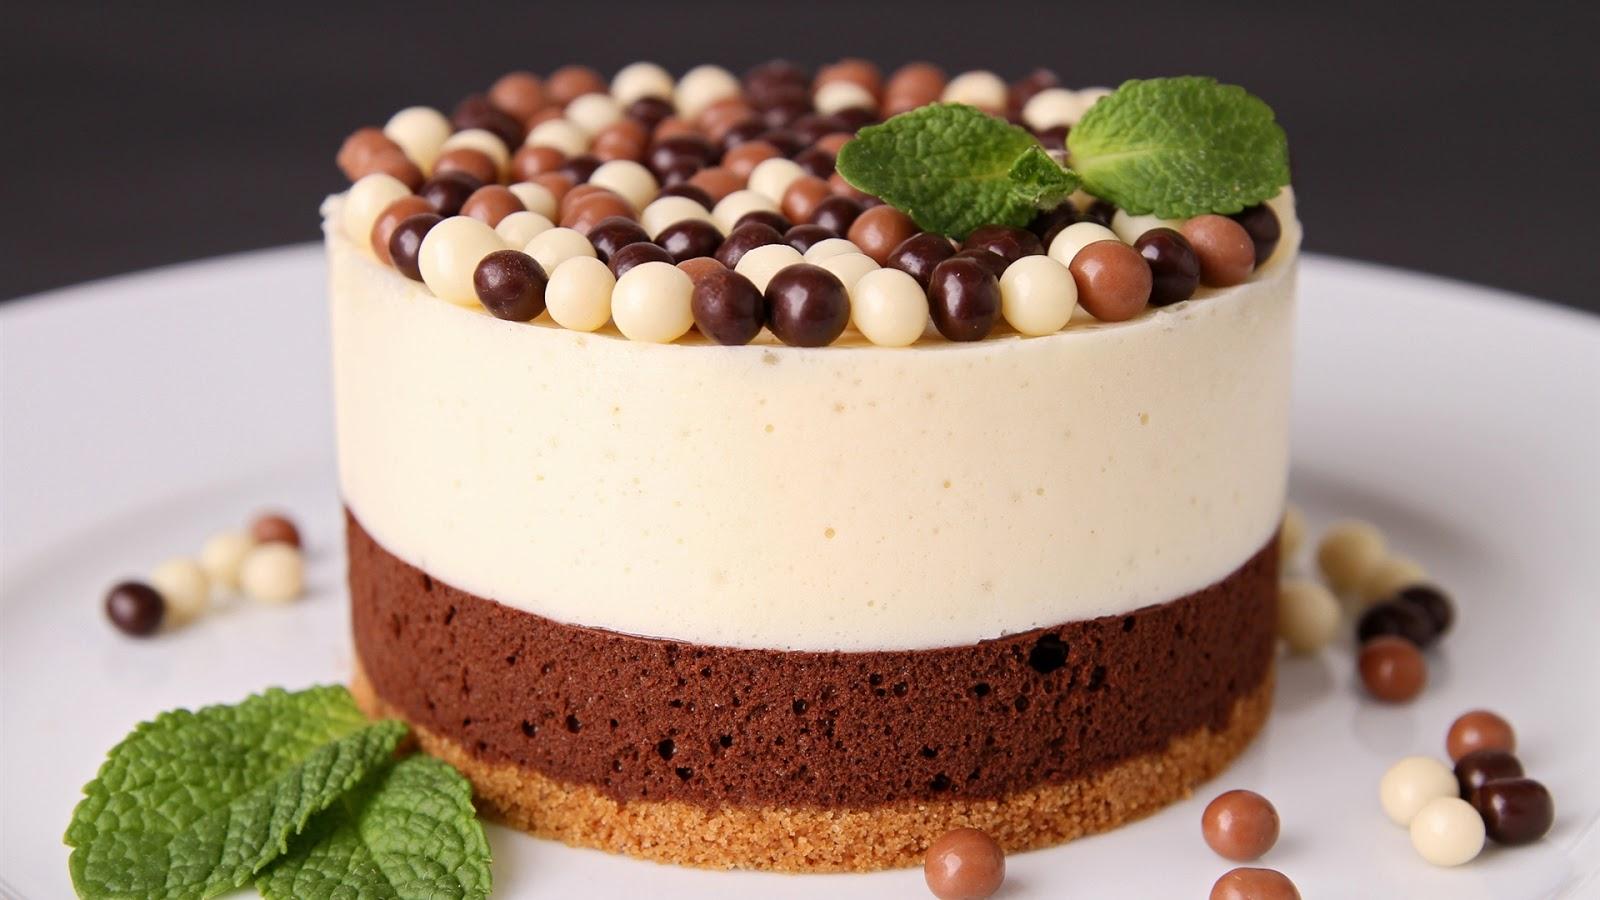 Chocolate Cake Images Dessert : Chocolate Cake Dessert Mint Leaves Full HD Desktop ...